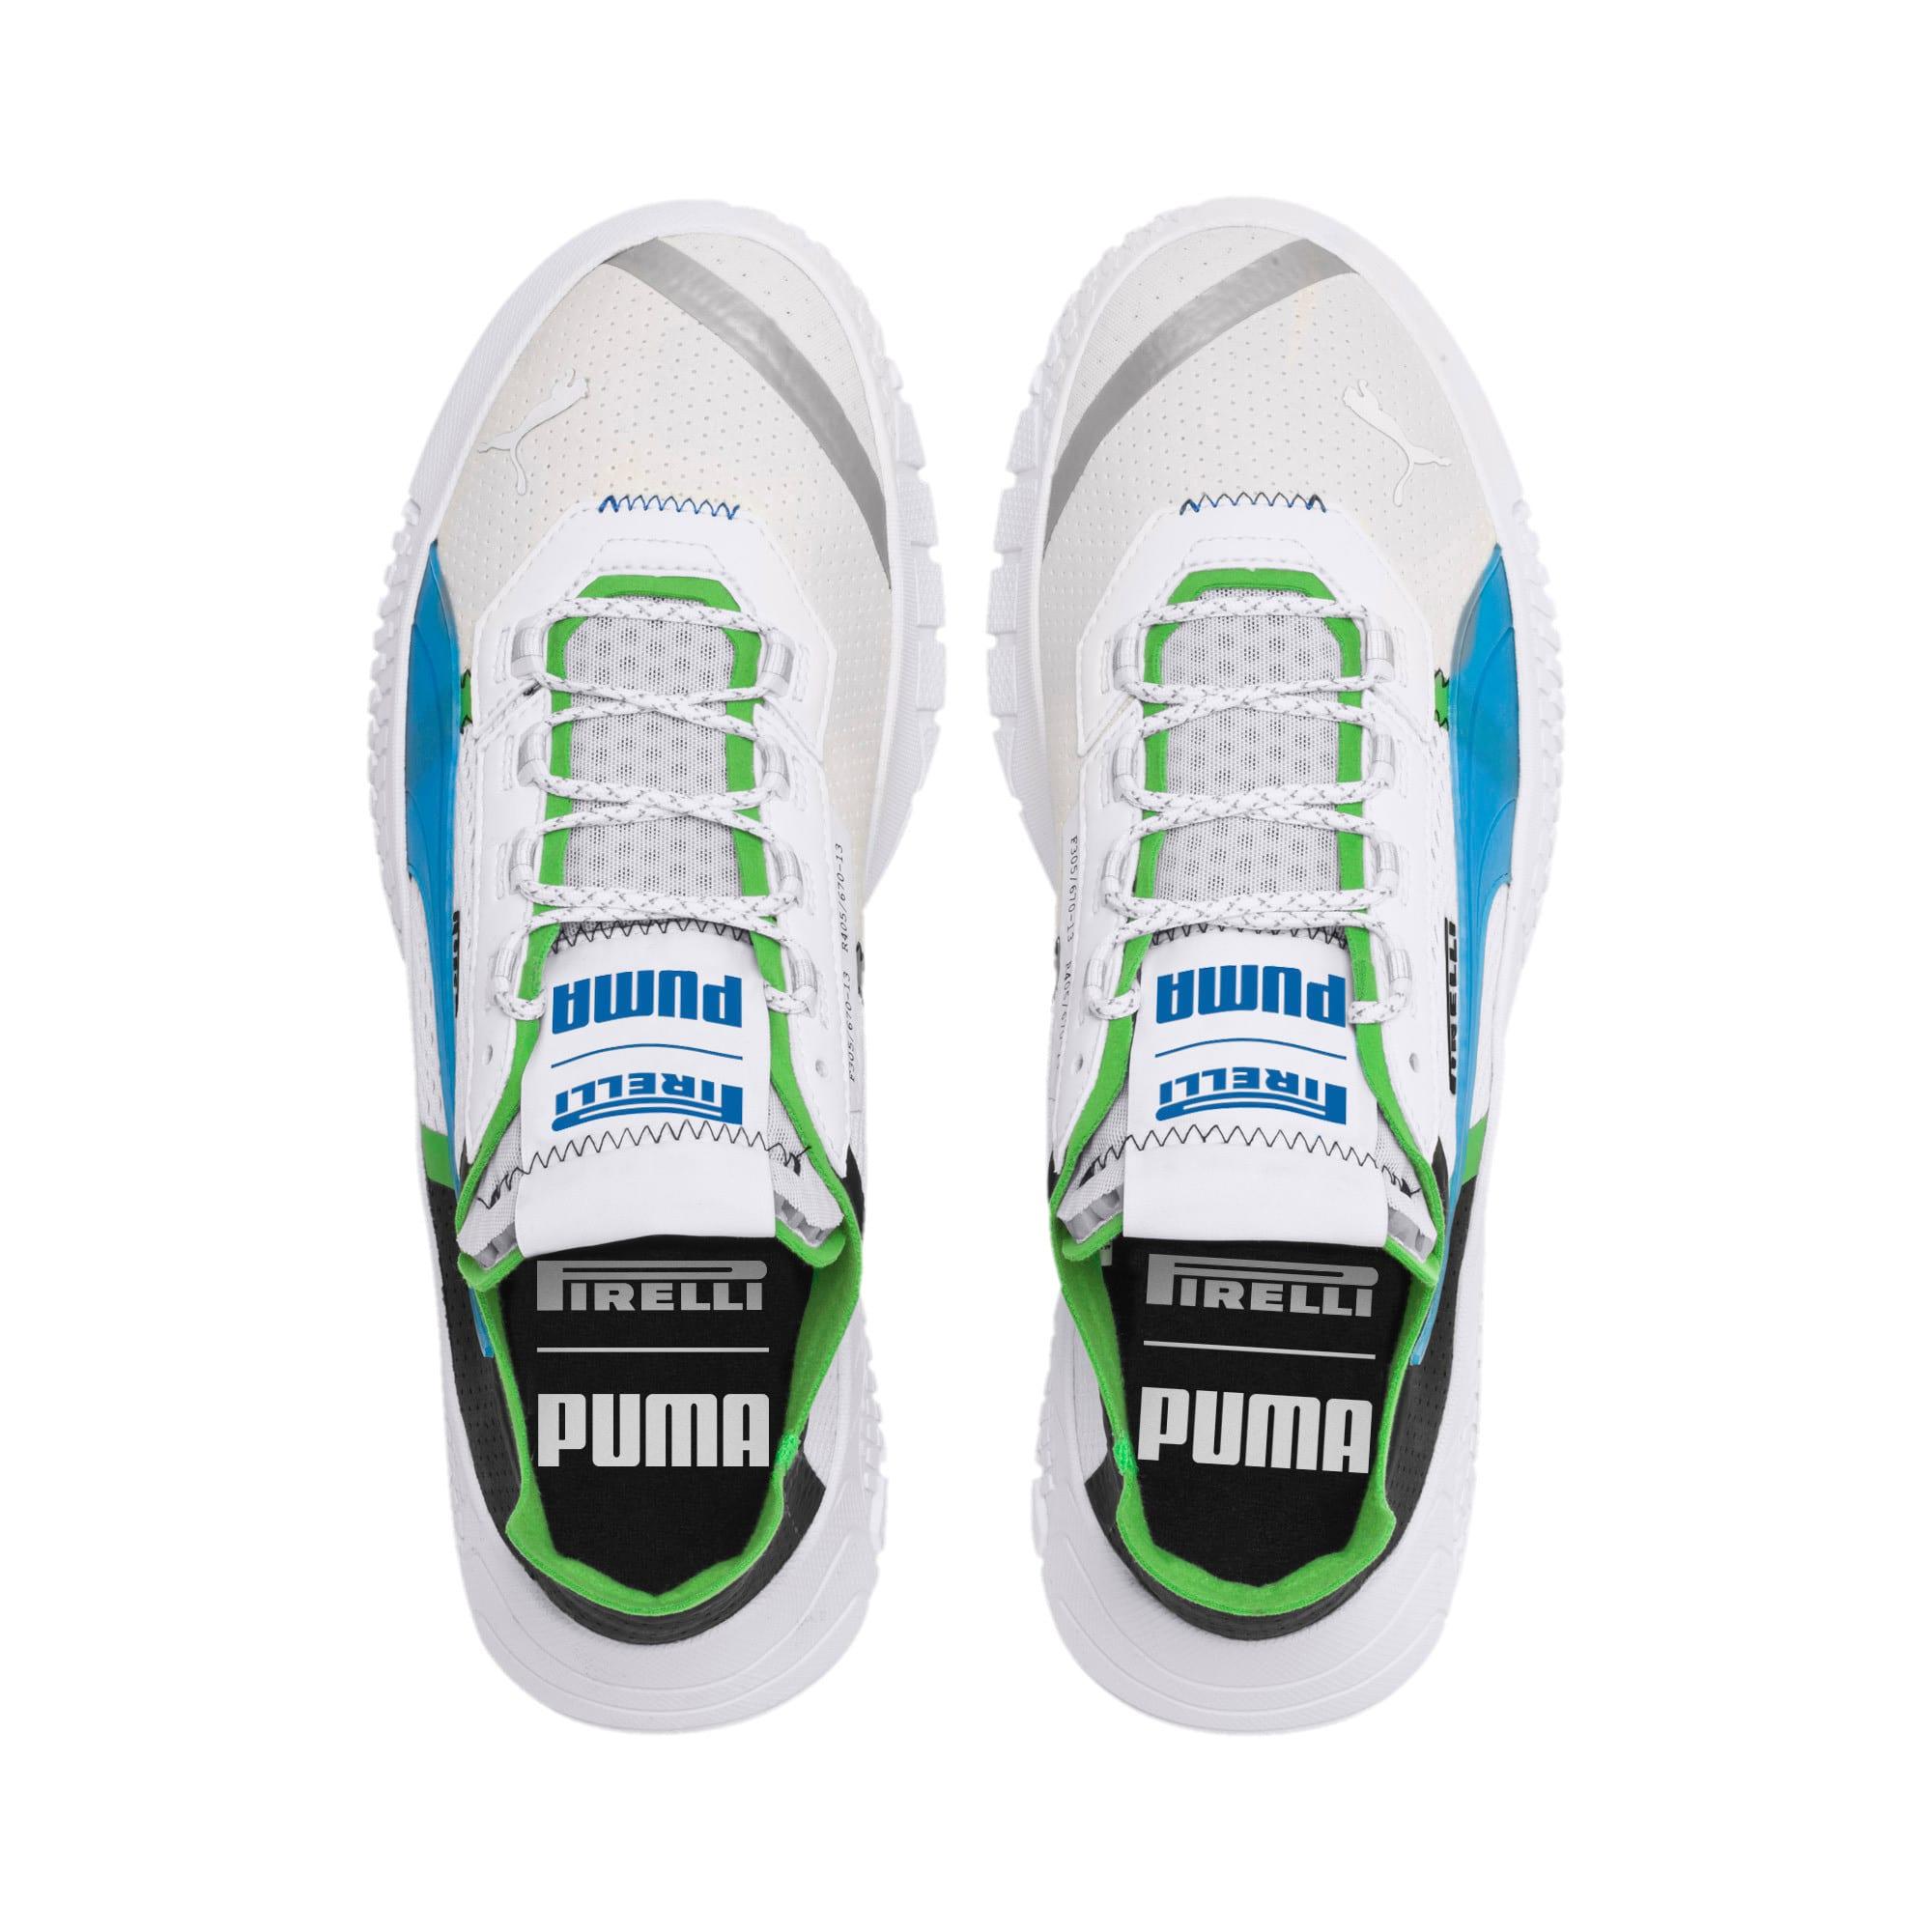 Thumbnail 7 of PUMA x PIRELLI レプリキャット X スニーカー, White-Black-Classic Green, medium-JPN